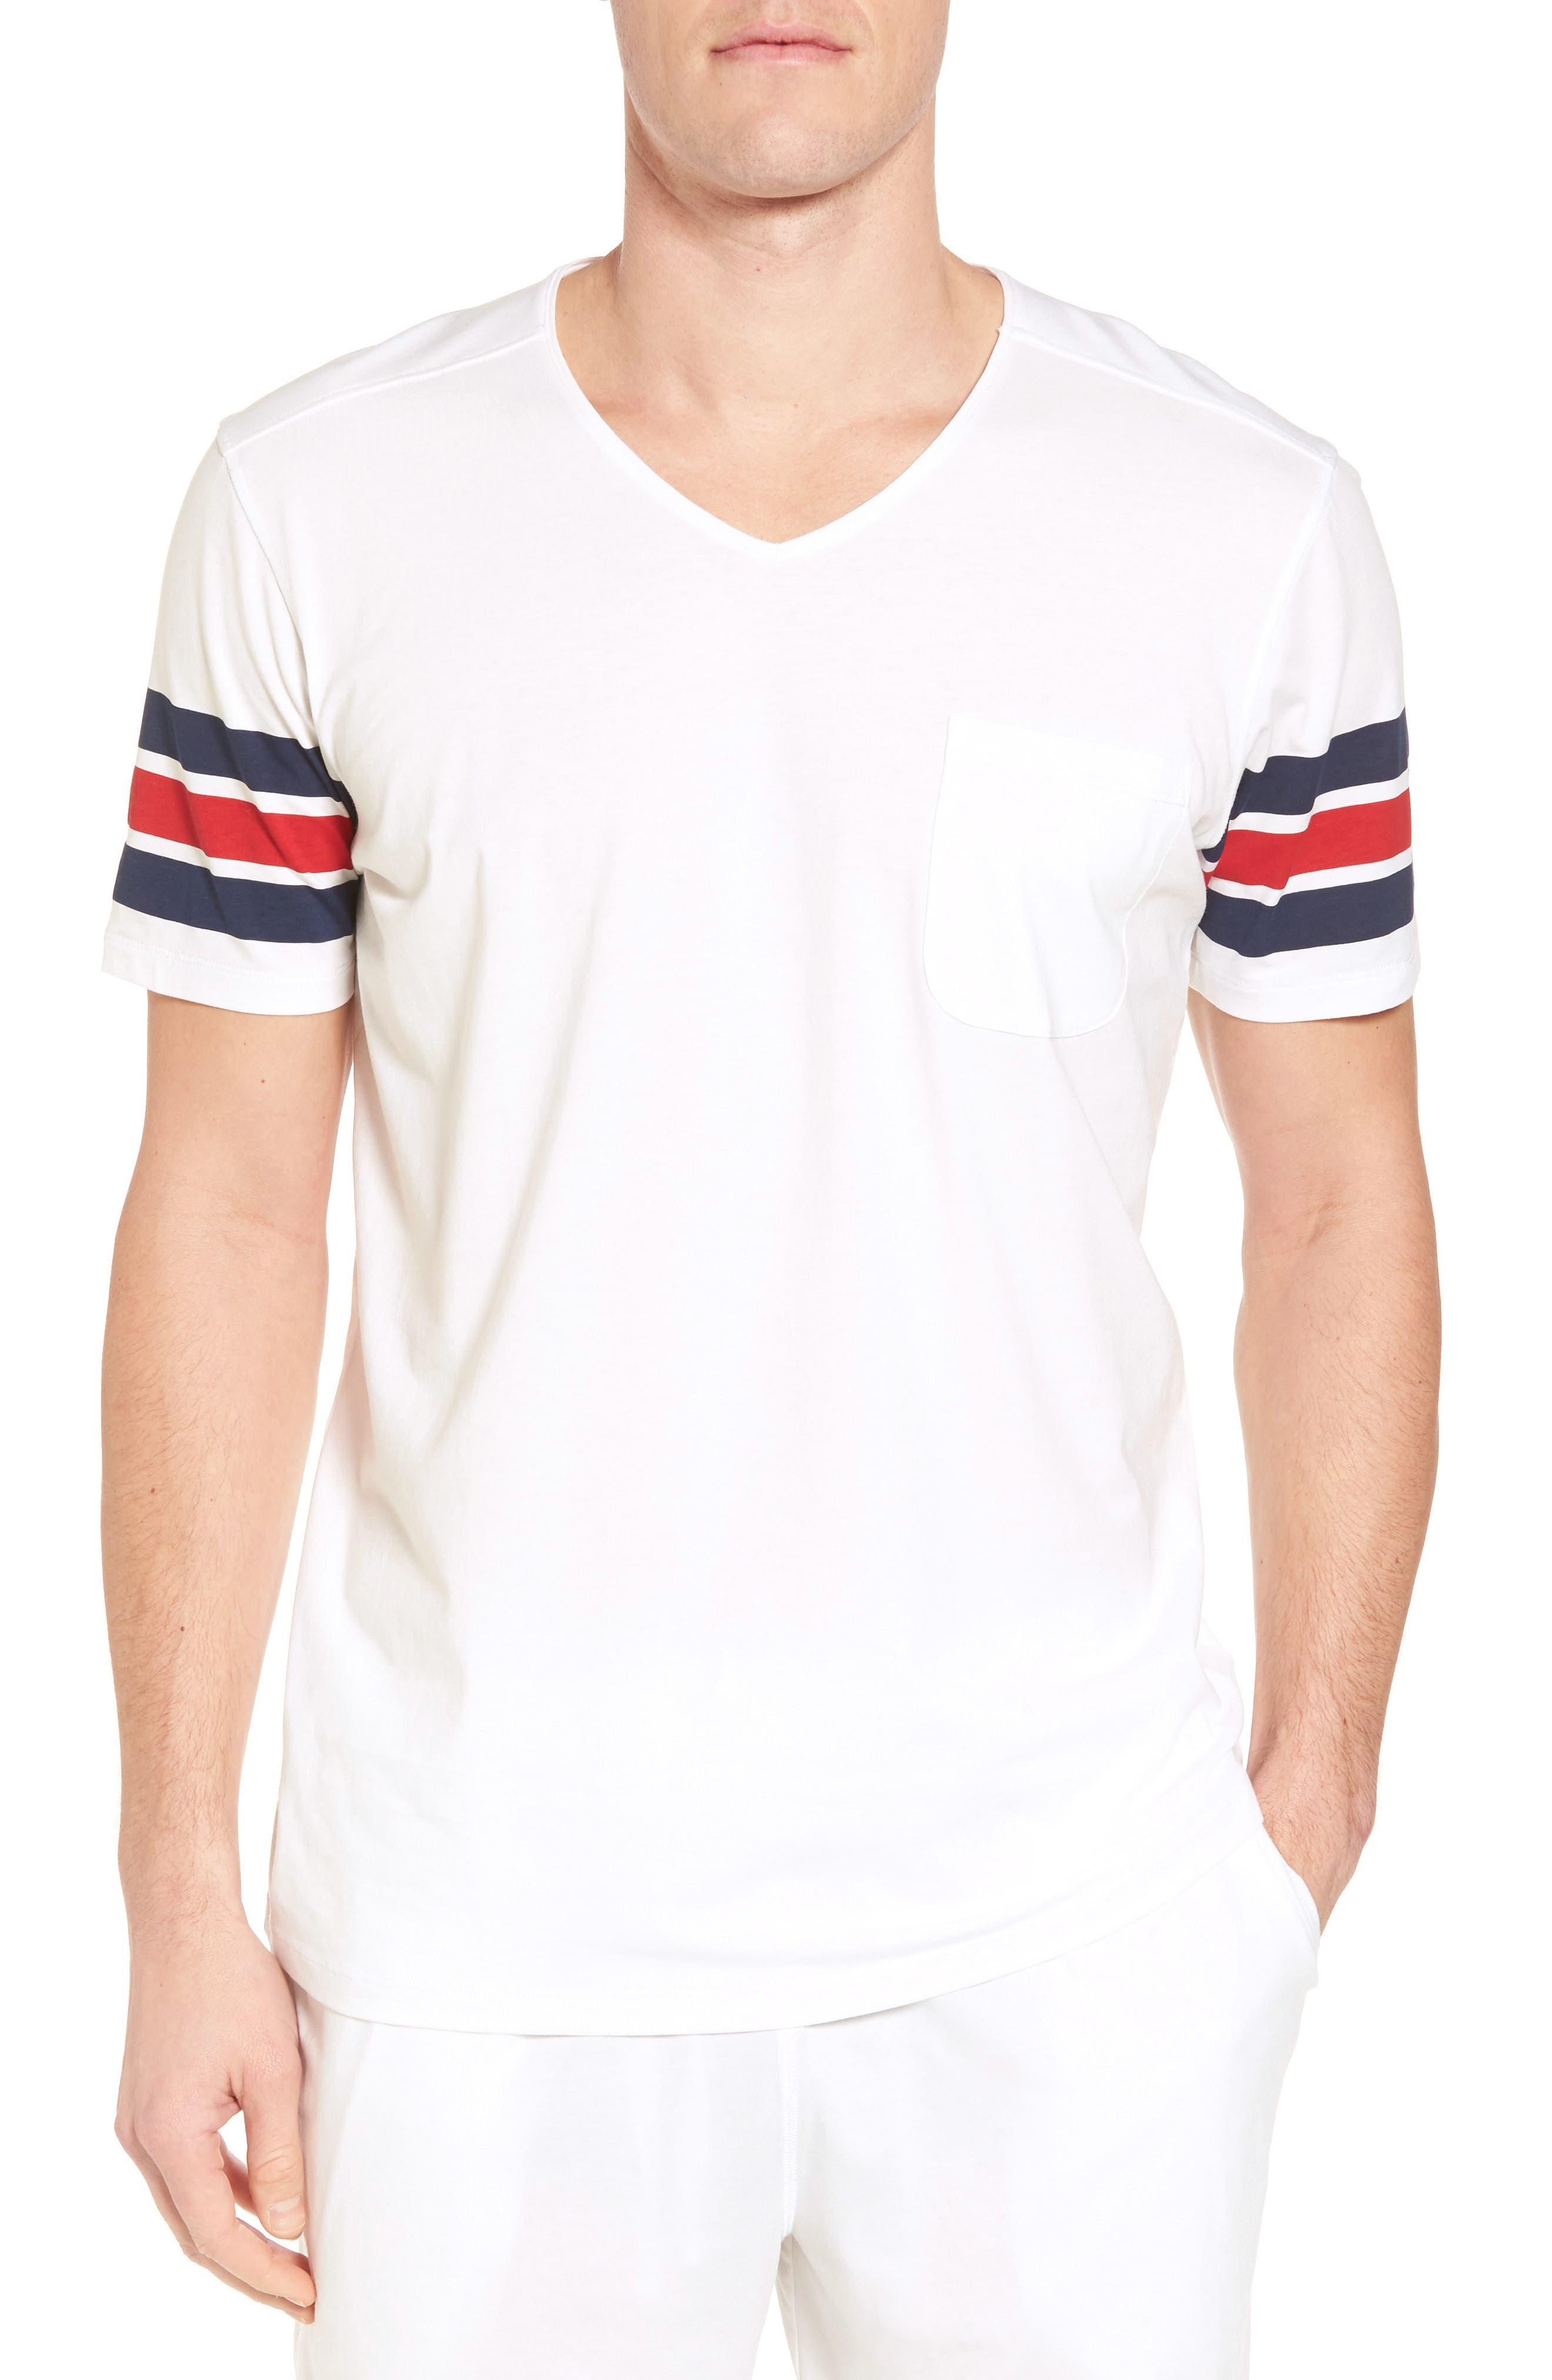 V-Neck Stretch Cotton Blend T-Shirt,                             Main thumbnail 1, color,                             Red/ Navy